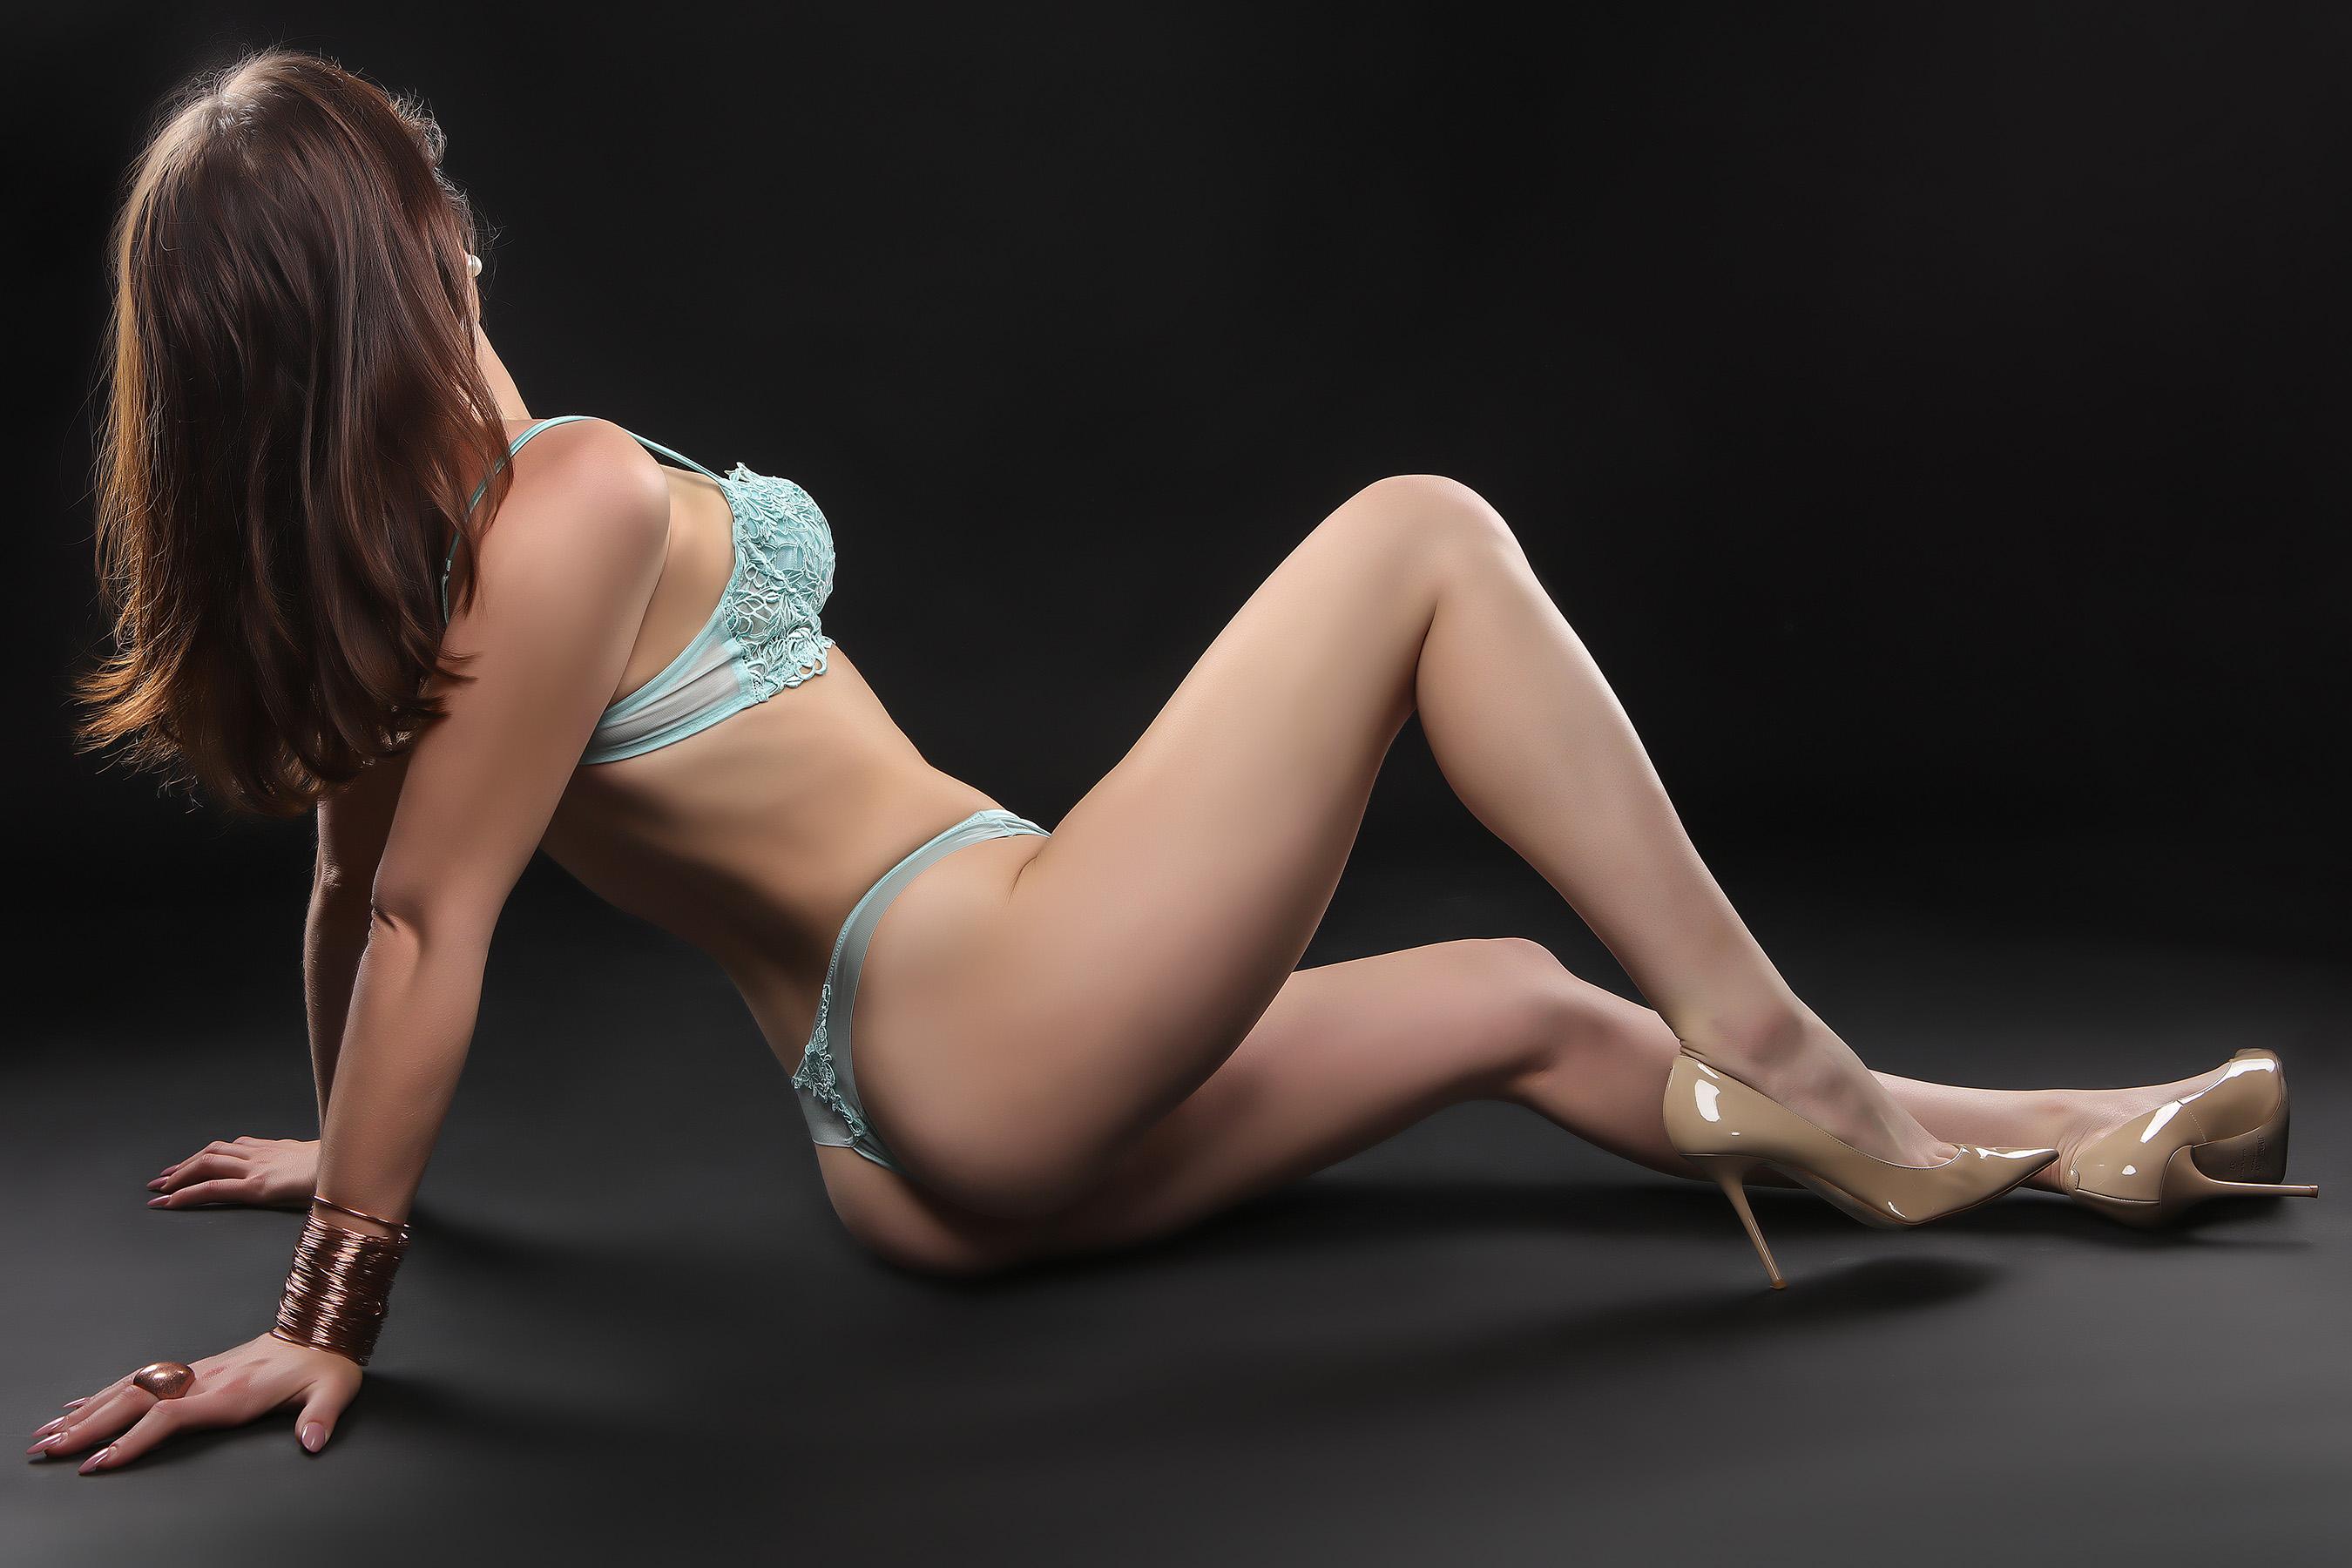 sex dessin escort paris france